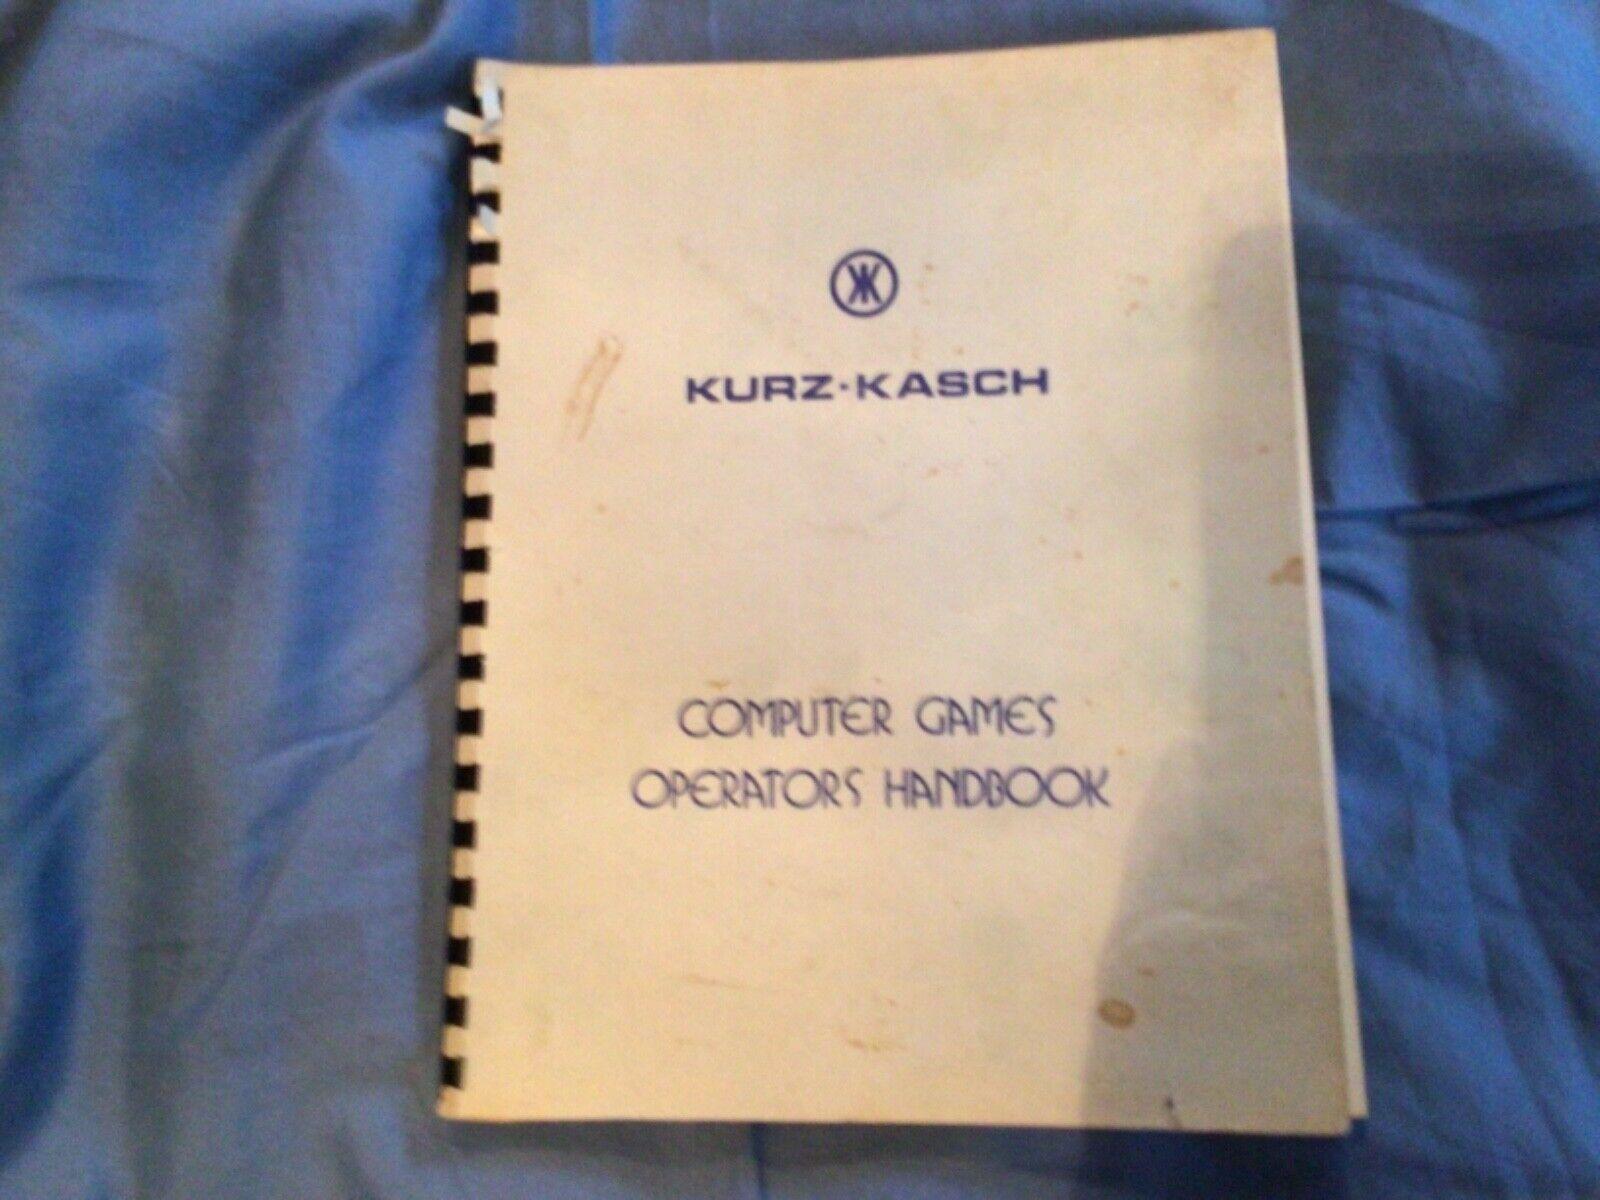 Computer Games - KURZ- KASCH COMPUTER GAMES OPERATORS HANDBOOK RARE MANUAL